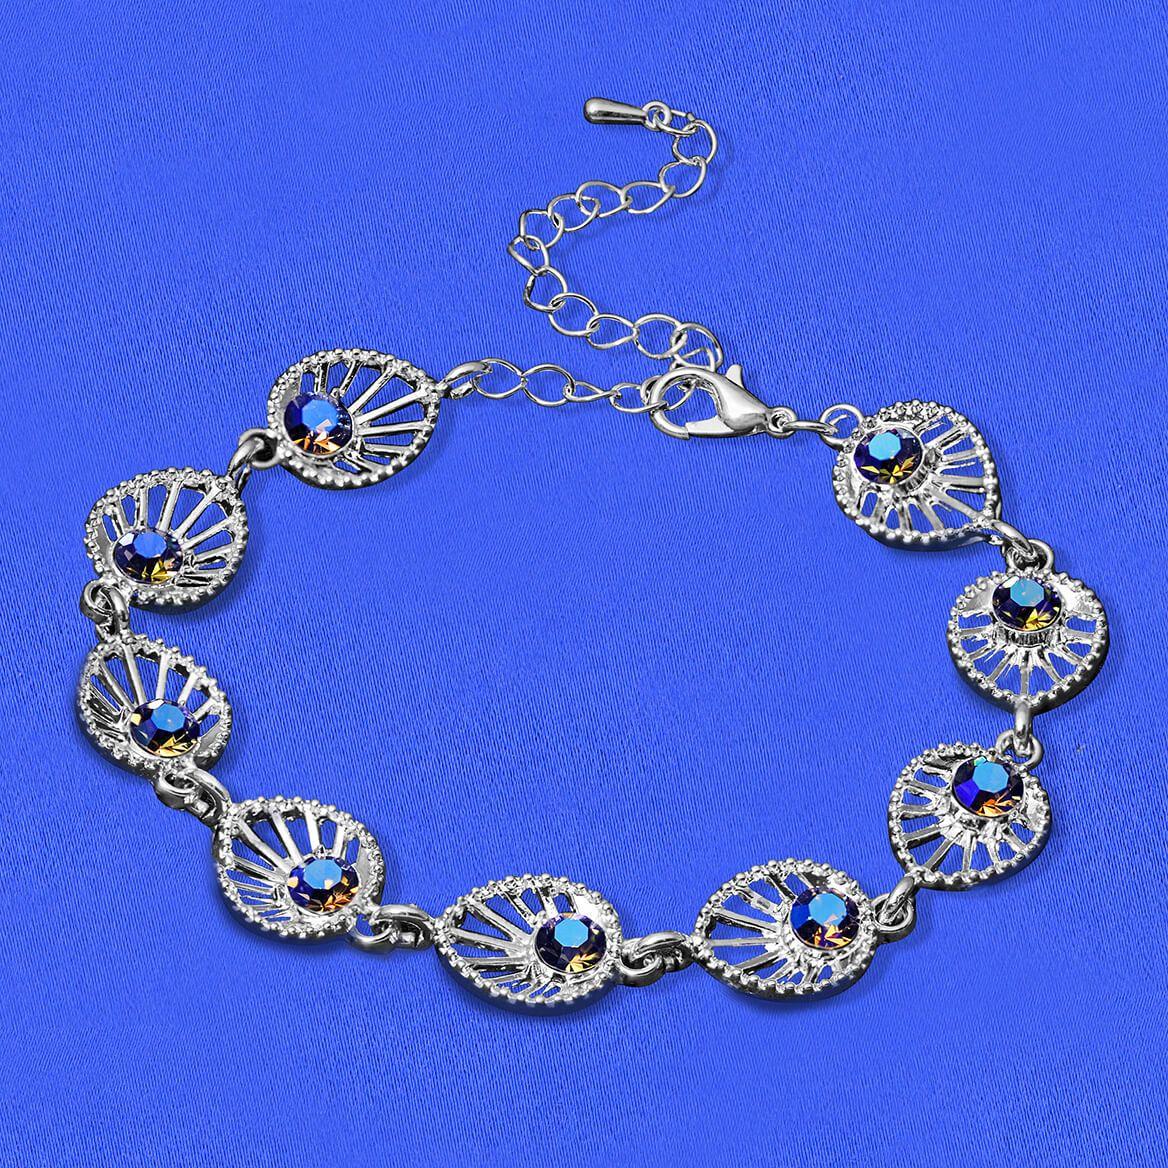 Radiant Bracelet with Swarovski® Crystals-371407